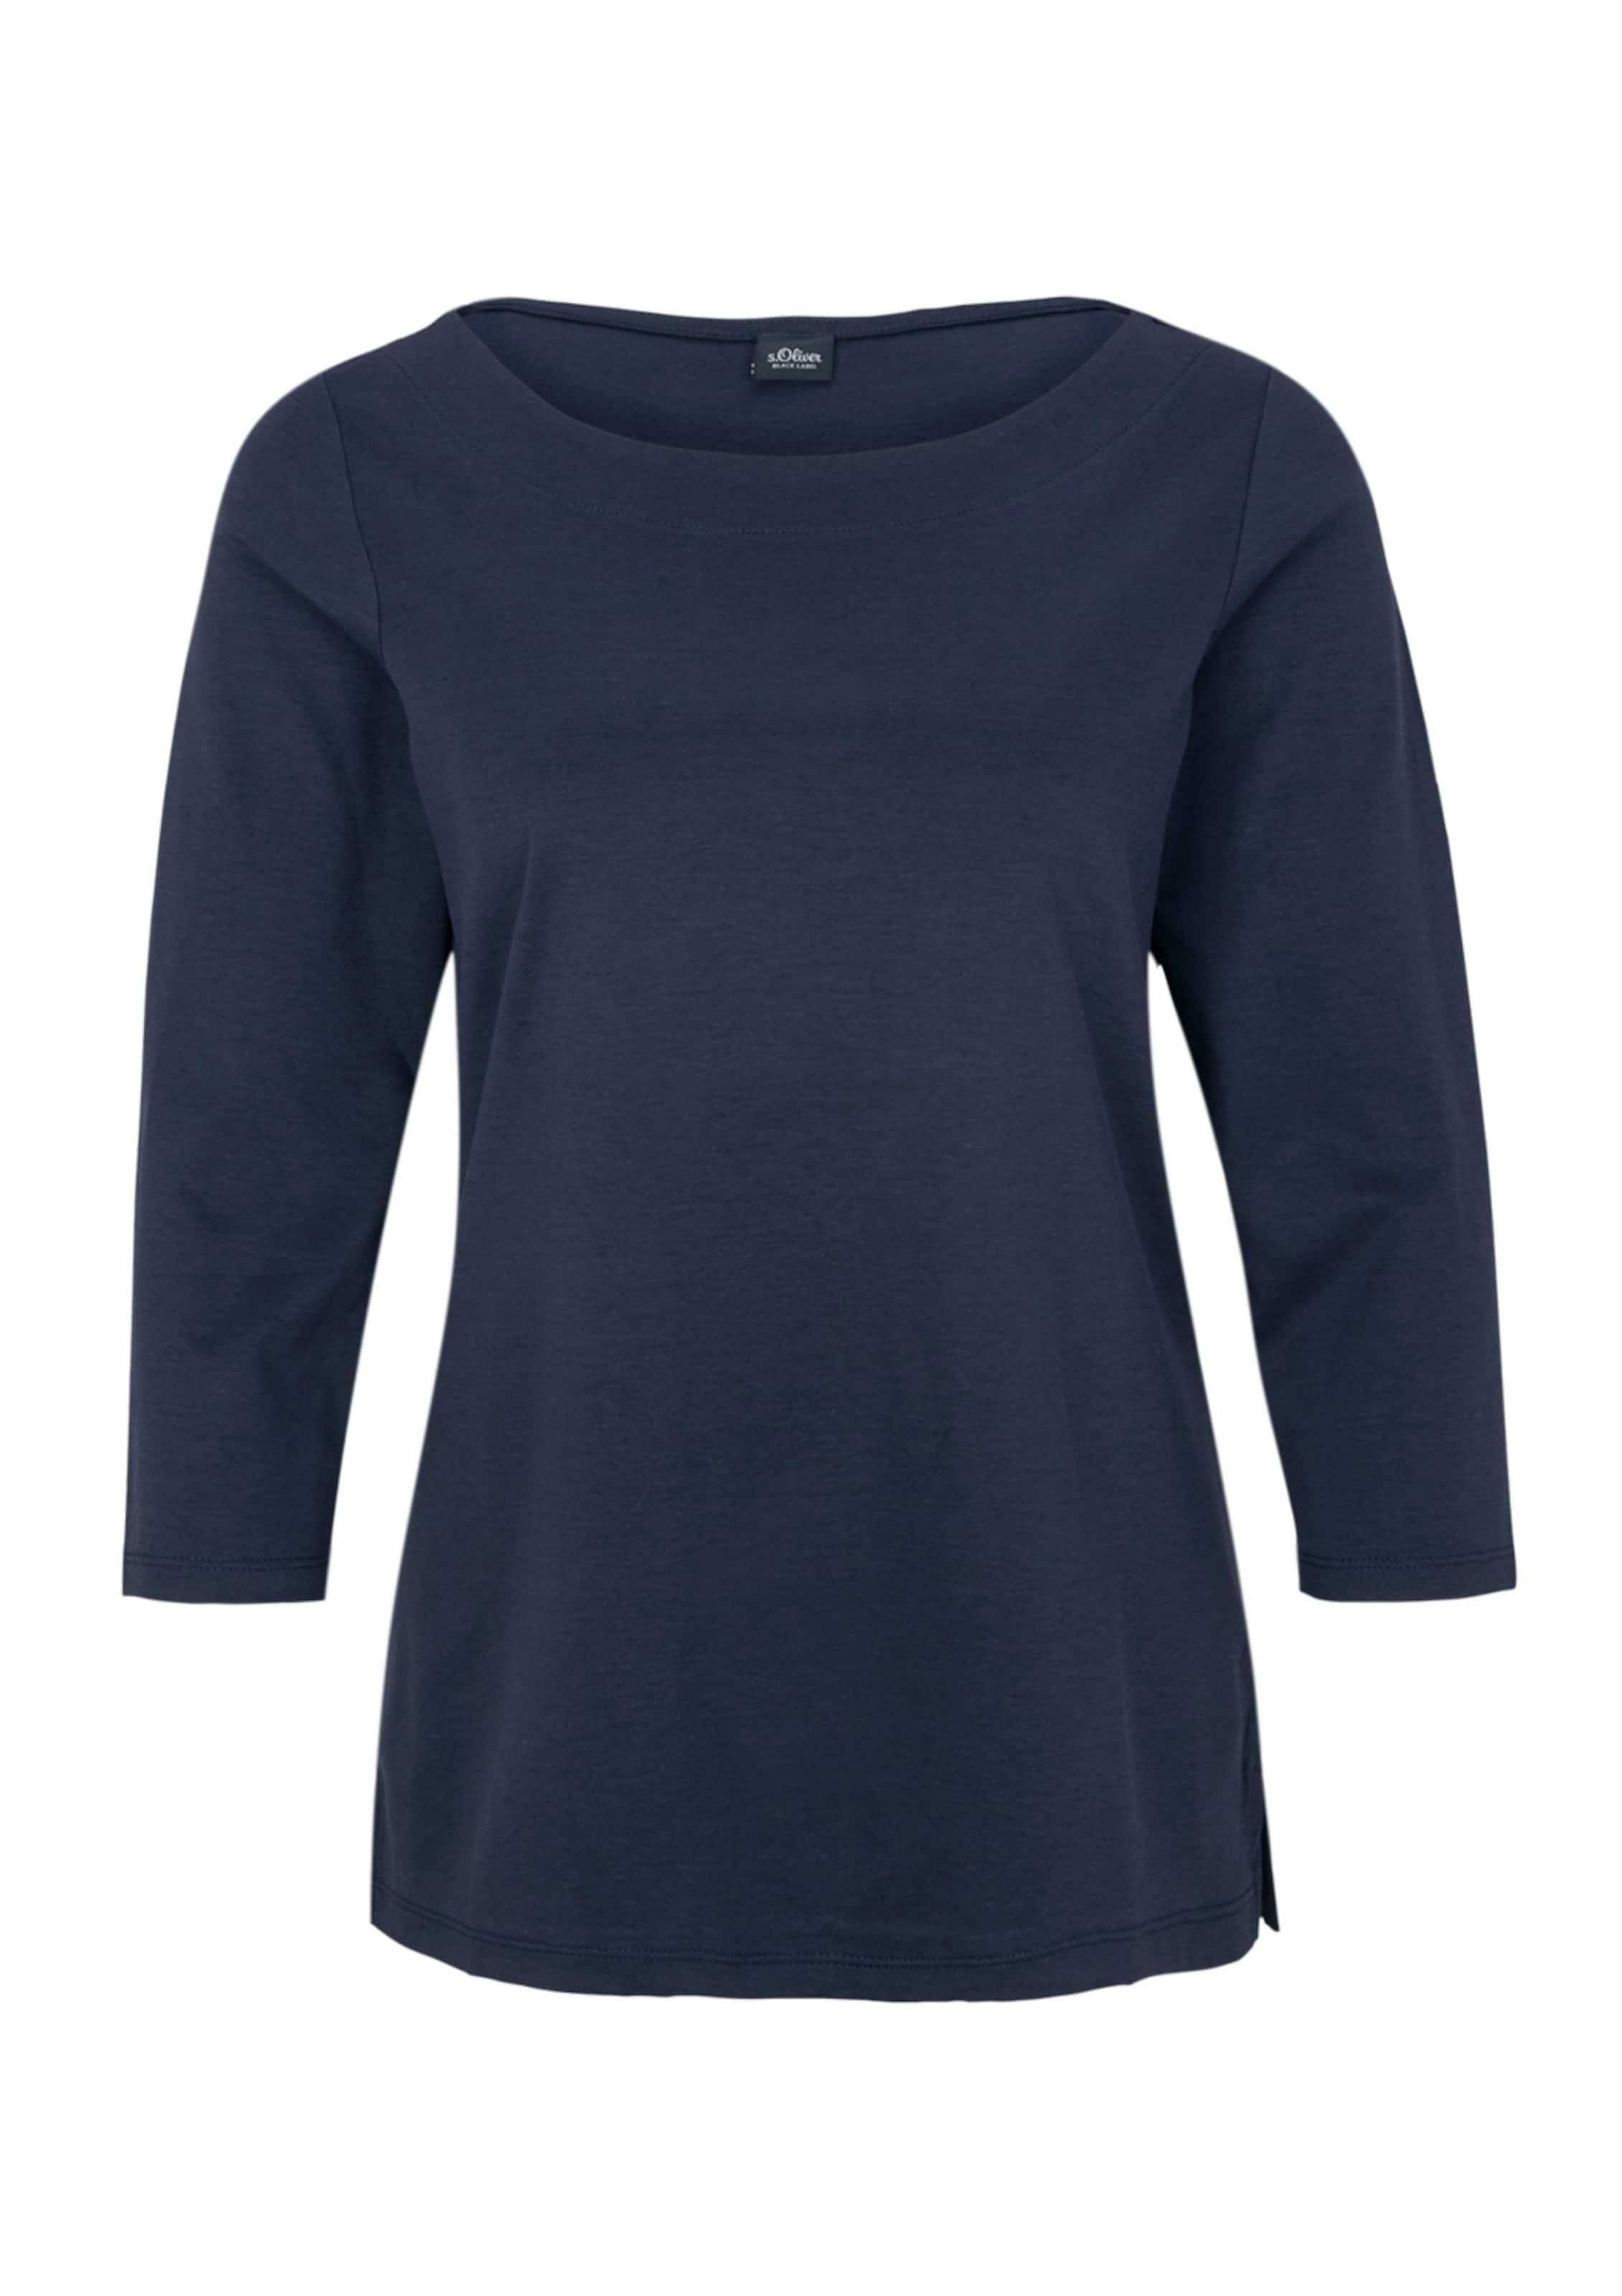 S Black Nachtblau oliver Shirt In Label doexBC